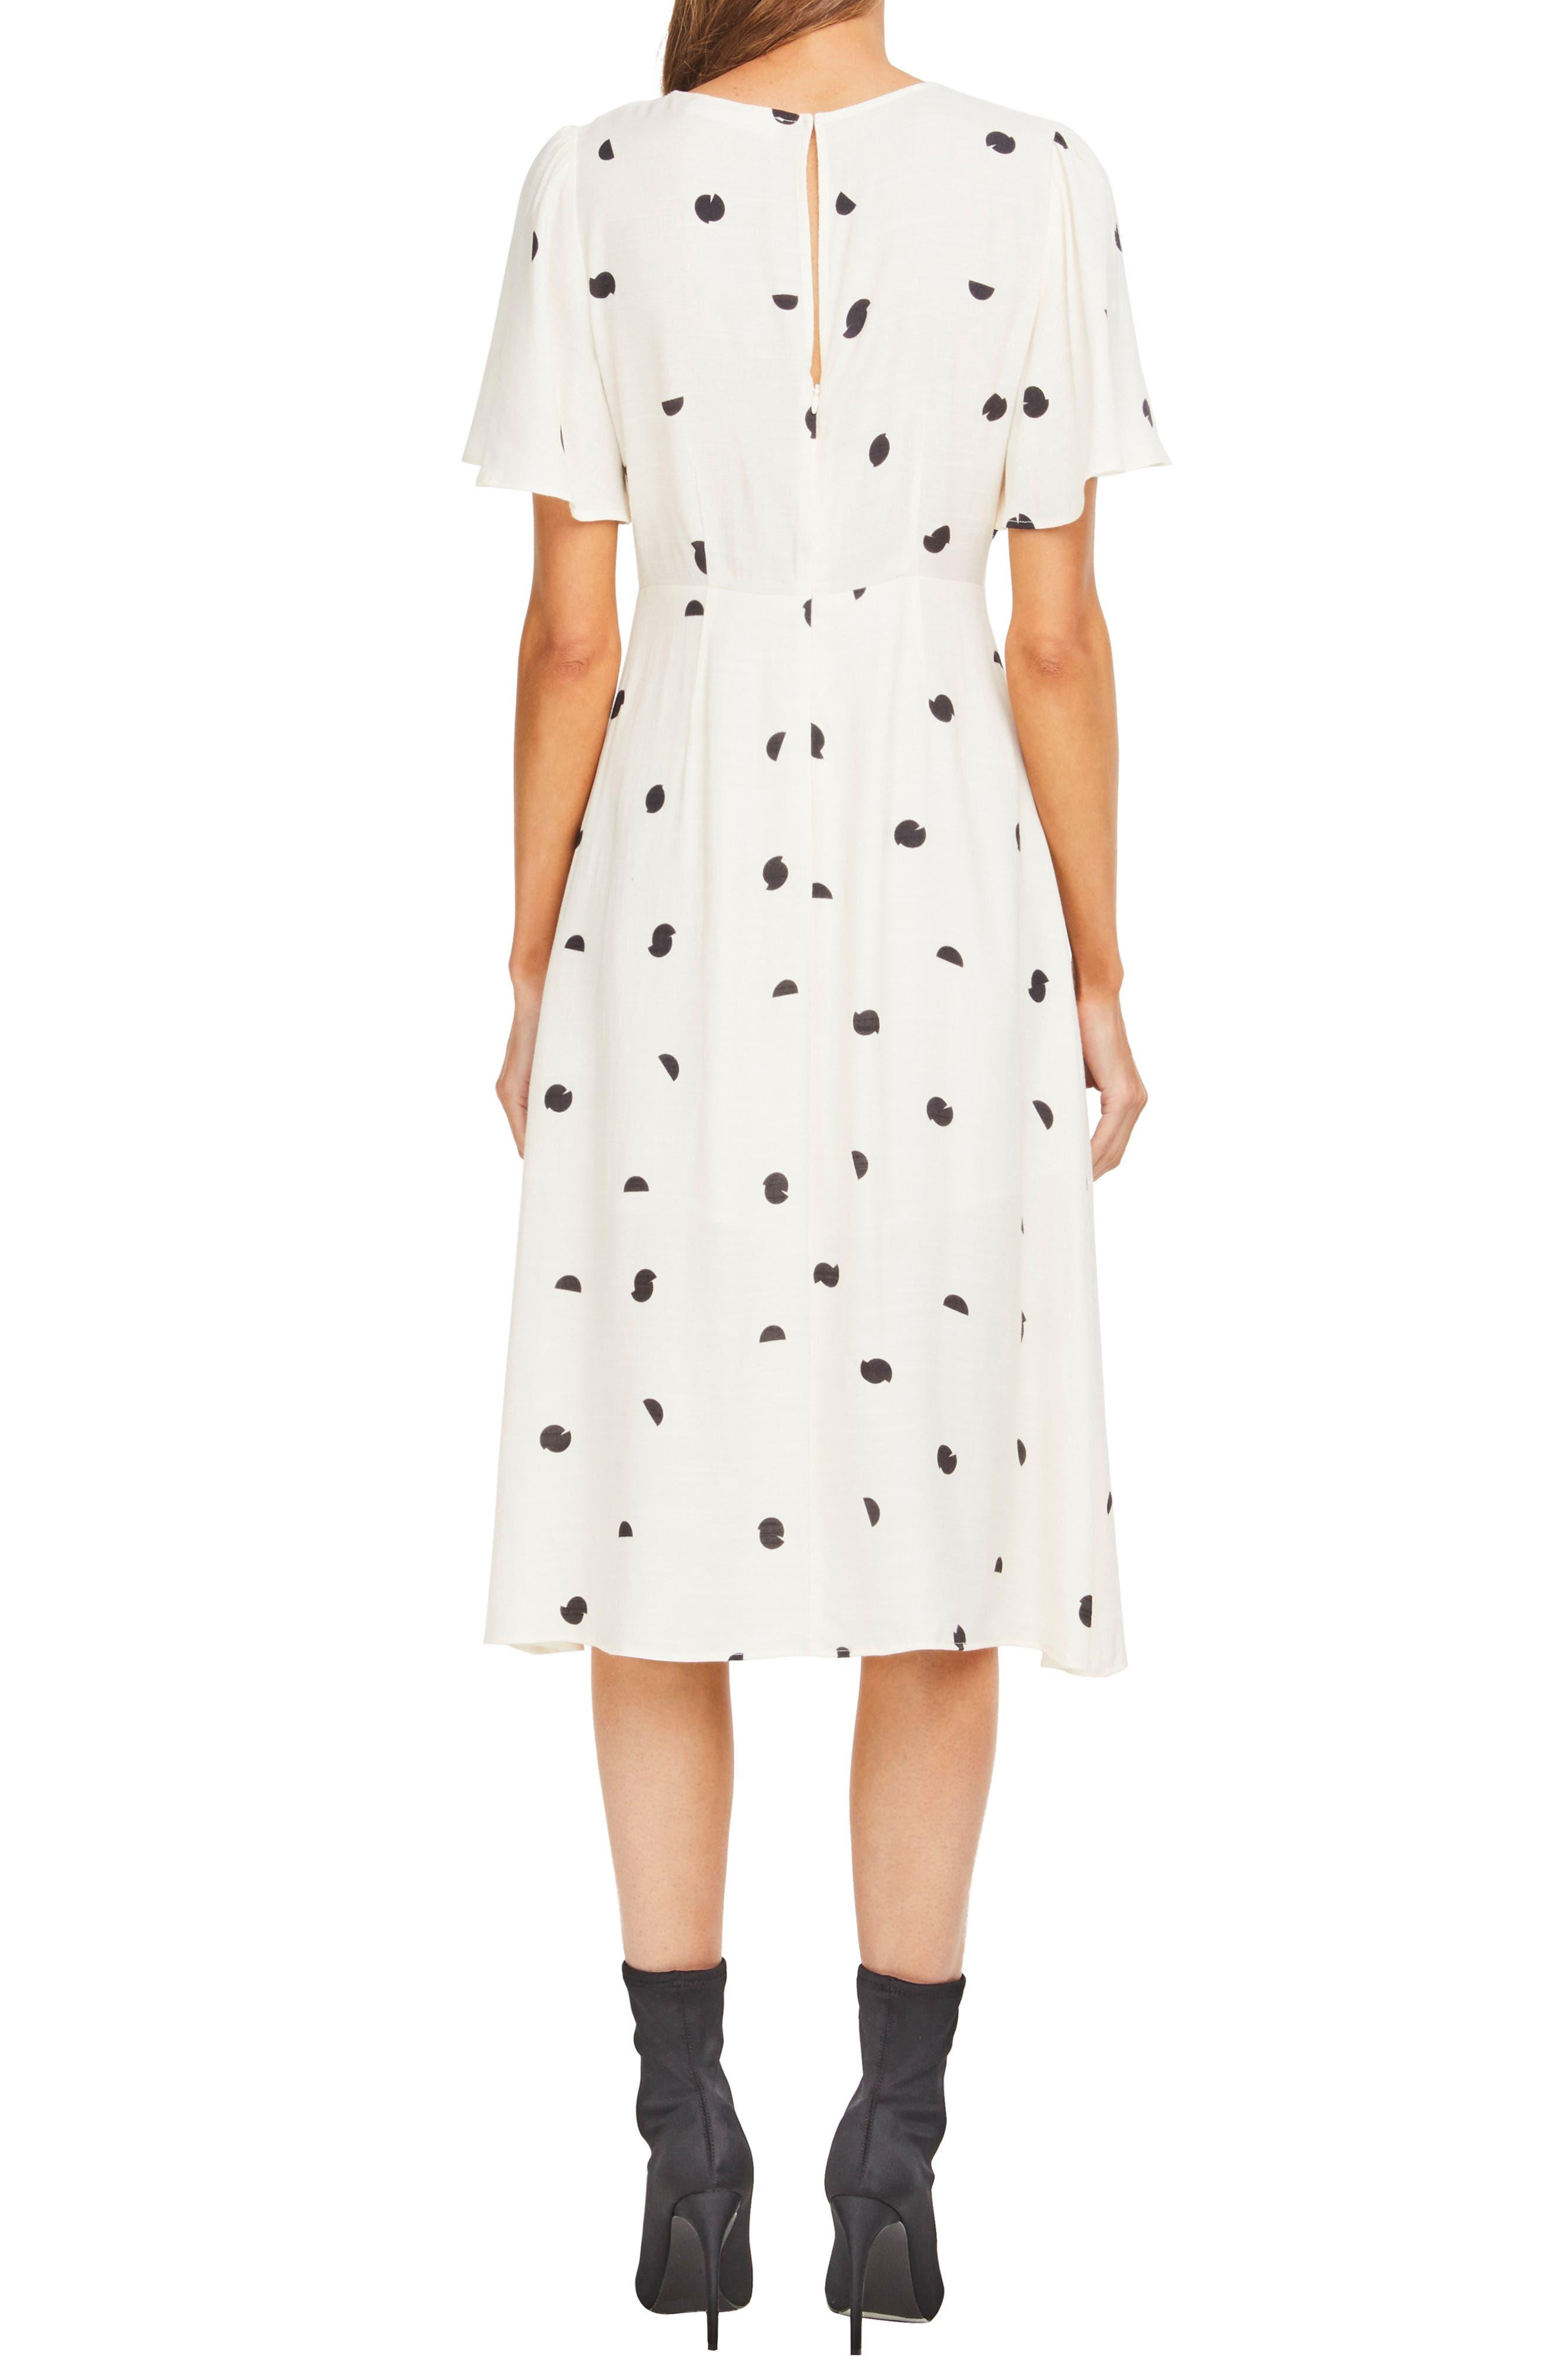 ASTR THE LABEL,                             Ebony Dress,                             Alternate thumbnail 2, color,                             900